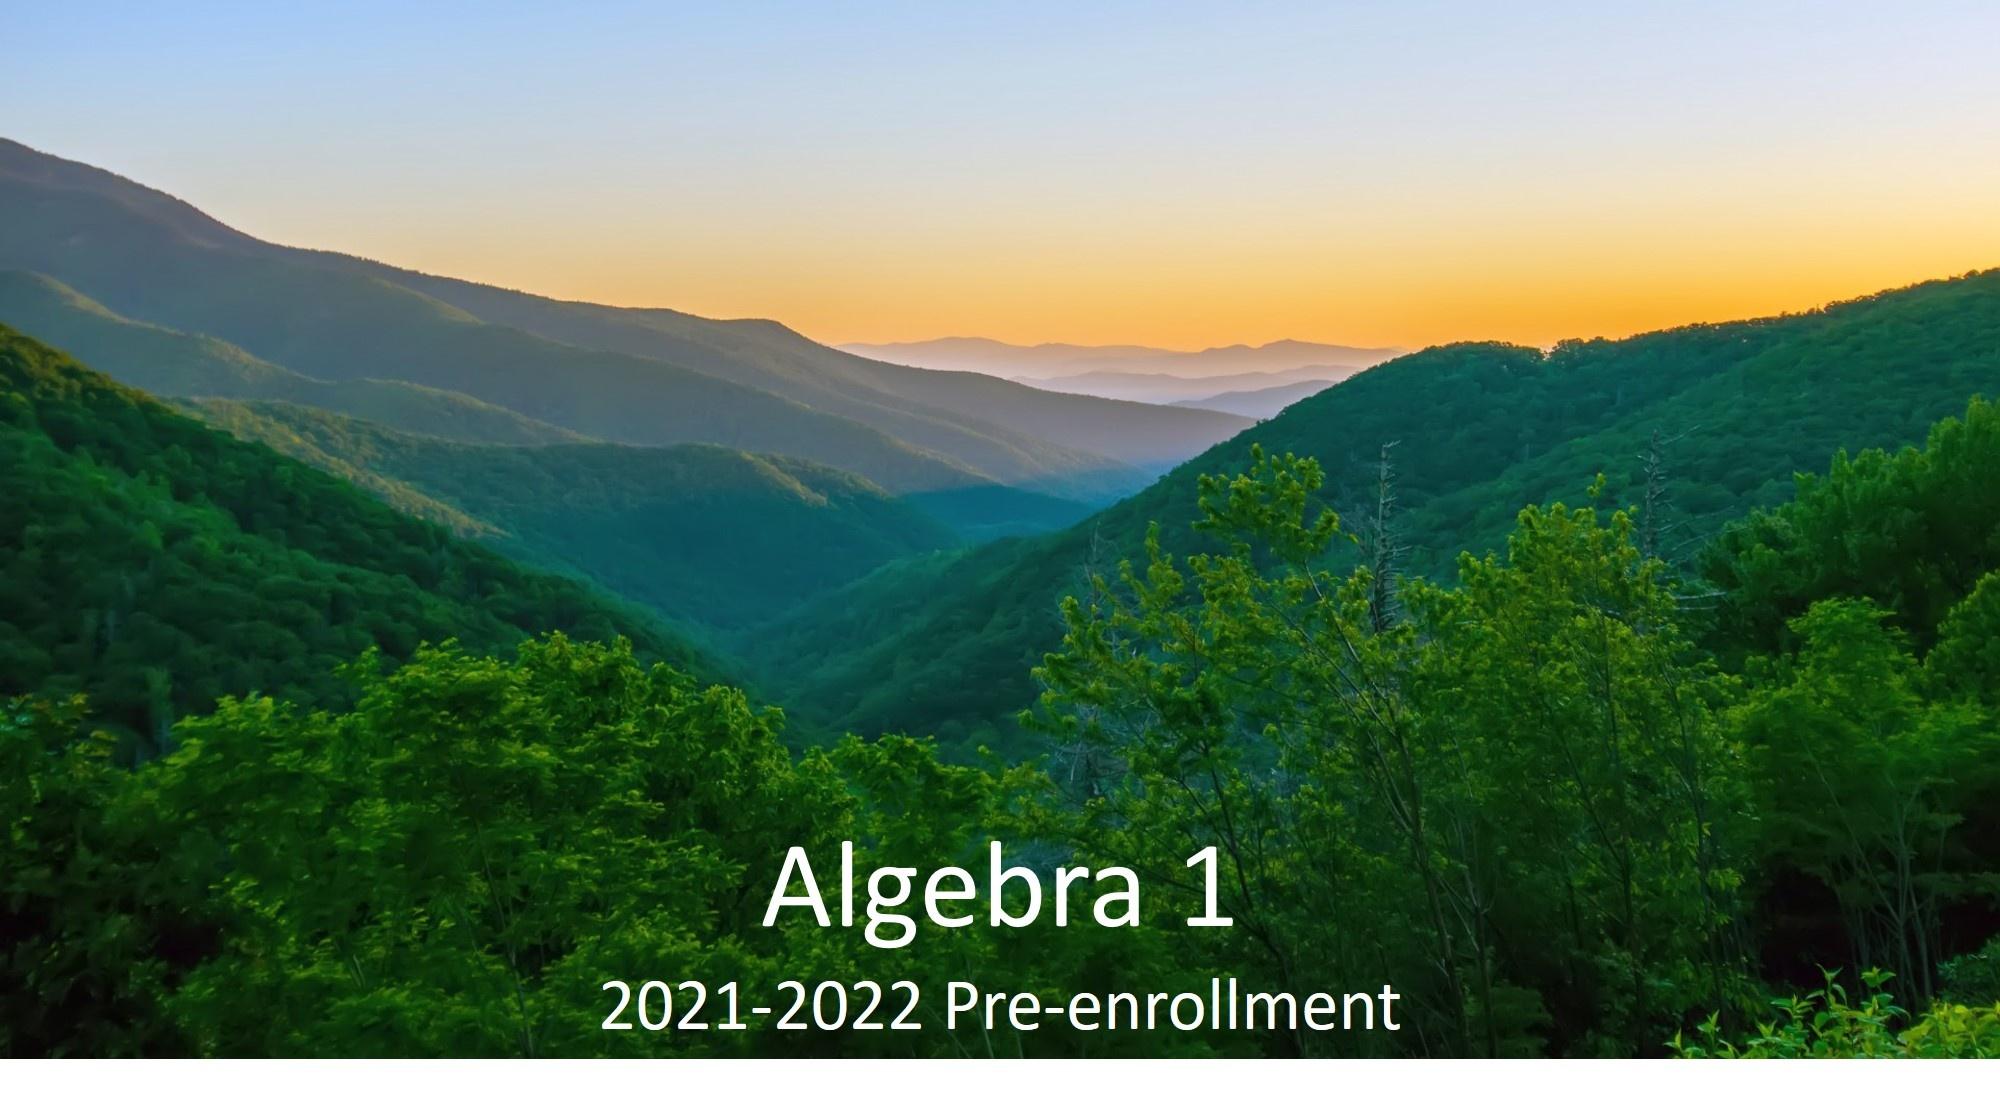 Algebra 1, Section 2: 2021-2022 Pre-enrollment